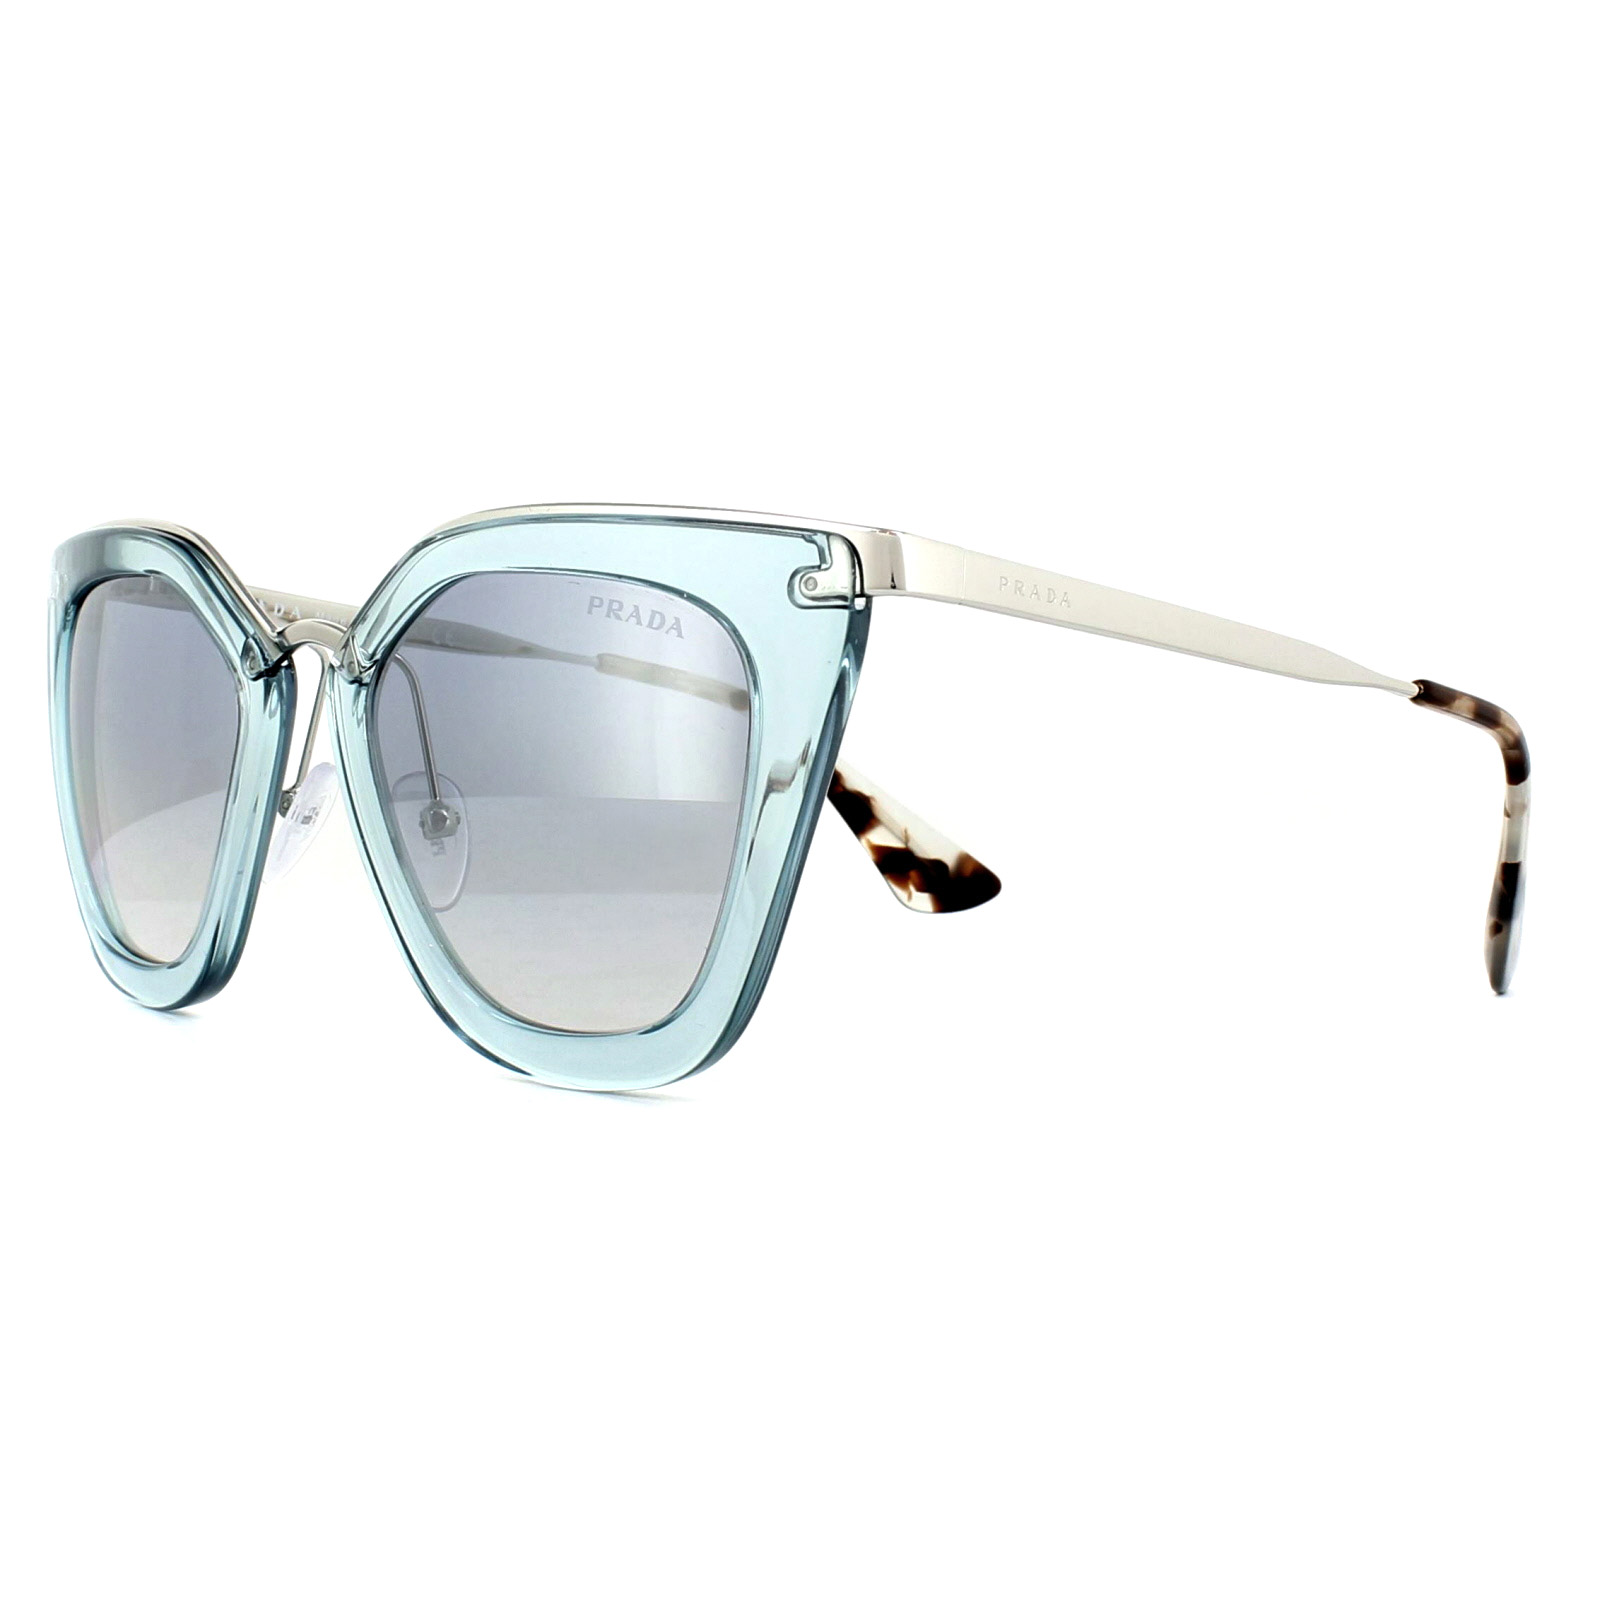 91ab24c8f6 Sentinel Prada Sunglasses Cinema Evolution 53SS VYS5R0 Transparent Azure  Blue Mirror